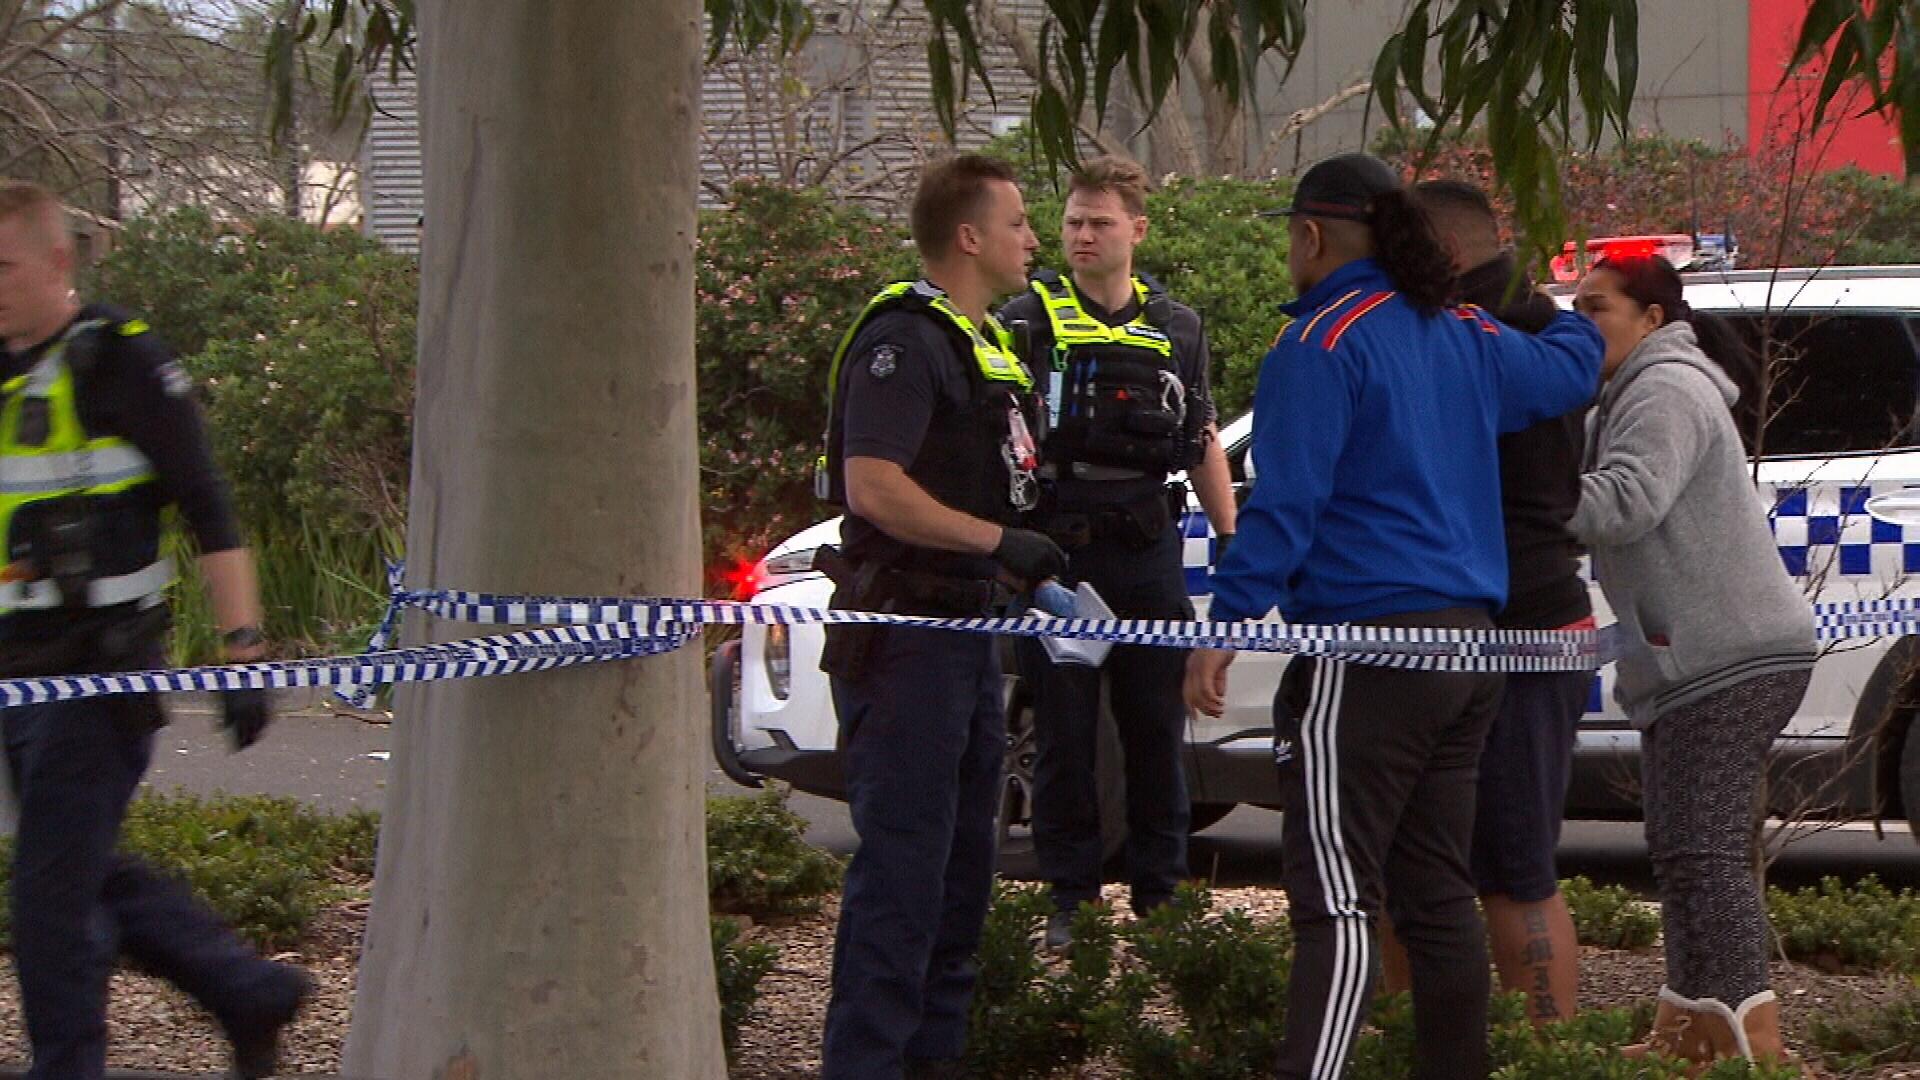 200616 Melbourne teen killed Brimbank Shopping Centre Deer Park group stabbing attack